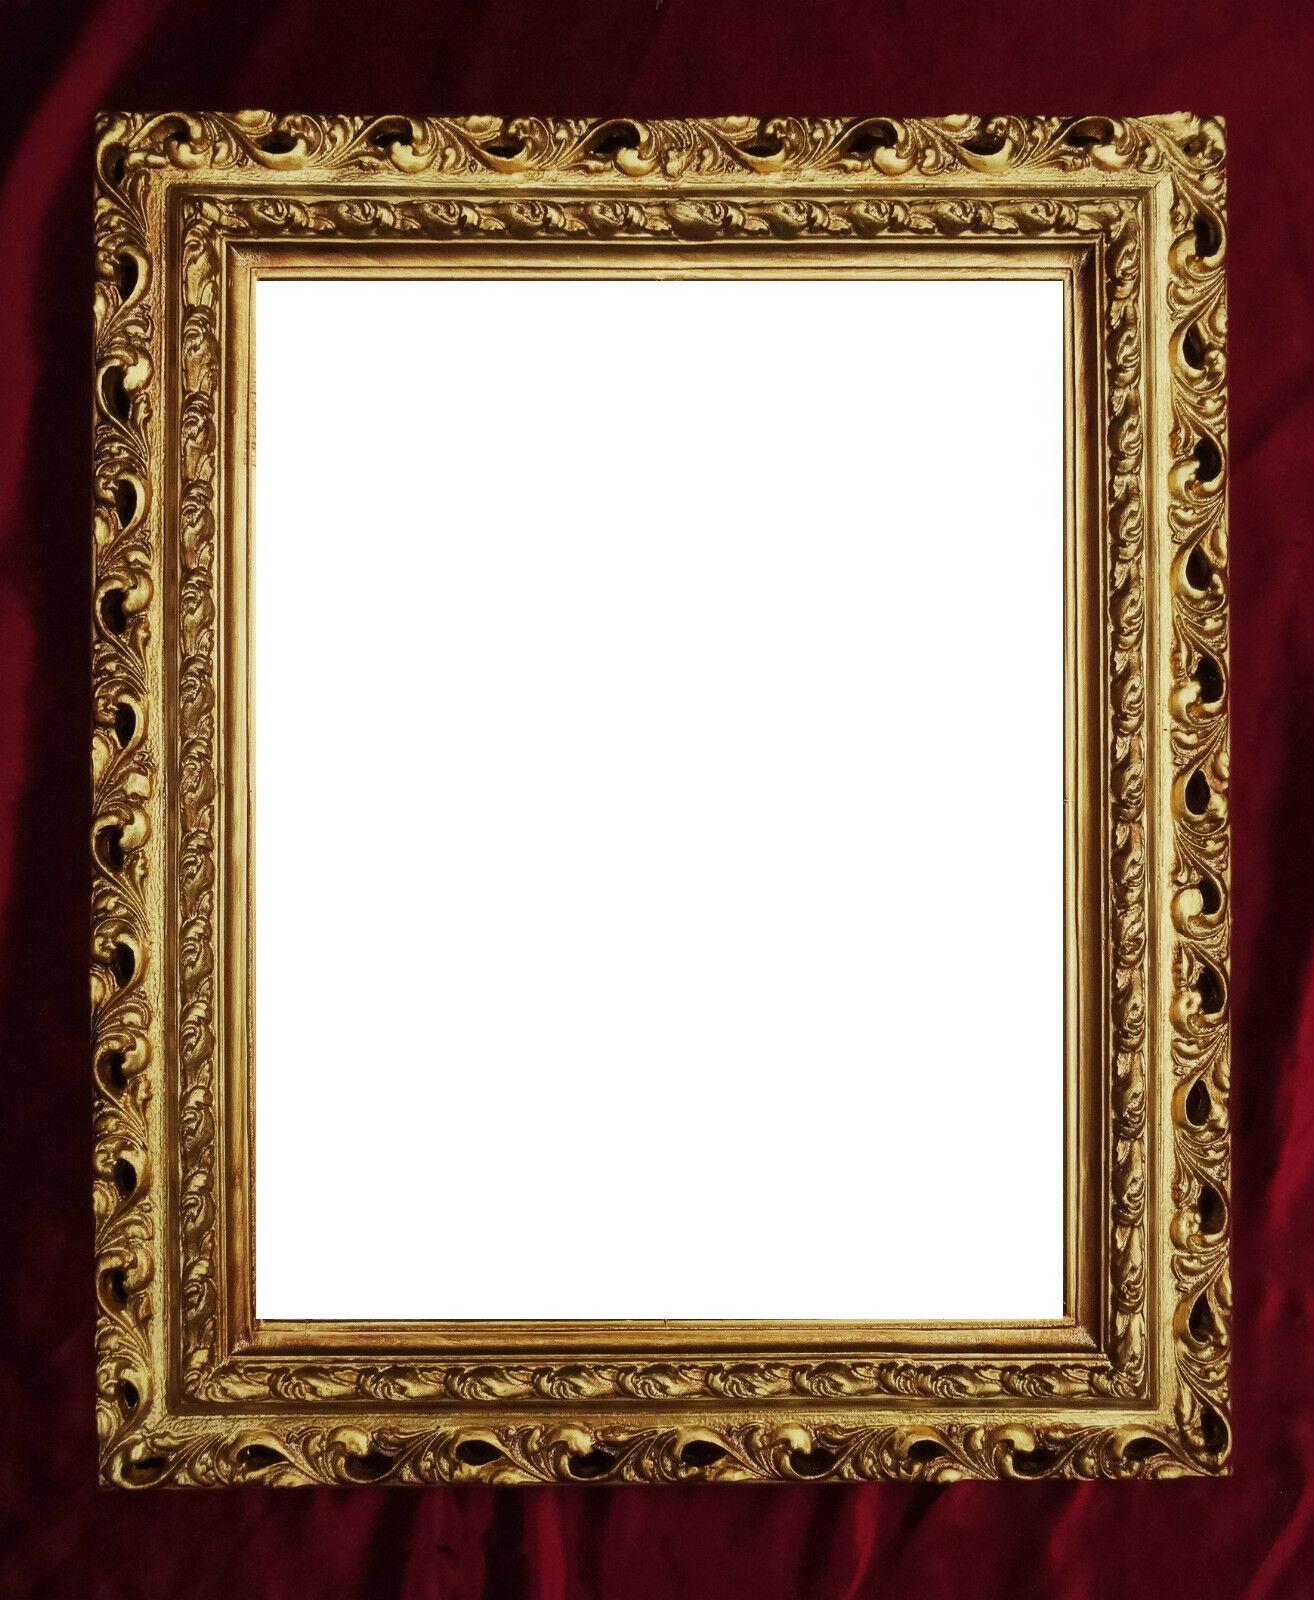 barock antik wandspiegel spiegel sonne runder spiegel in gold 42x42 cm 2 ebay. Black Bedroom Furniture Sets. Home Design Ideas